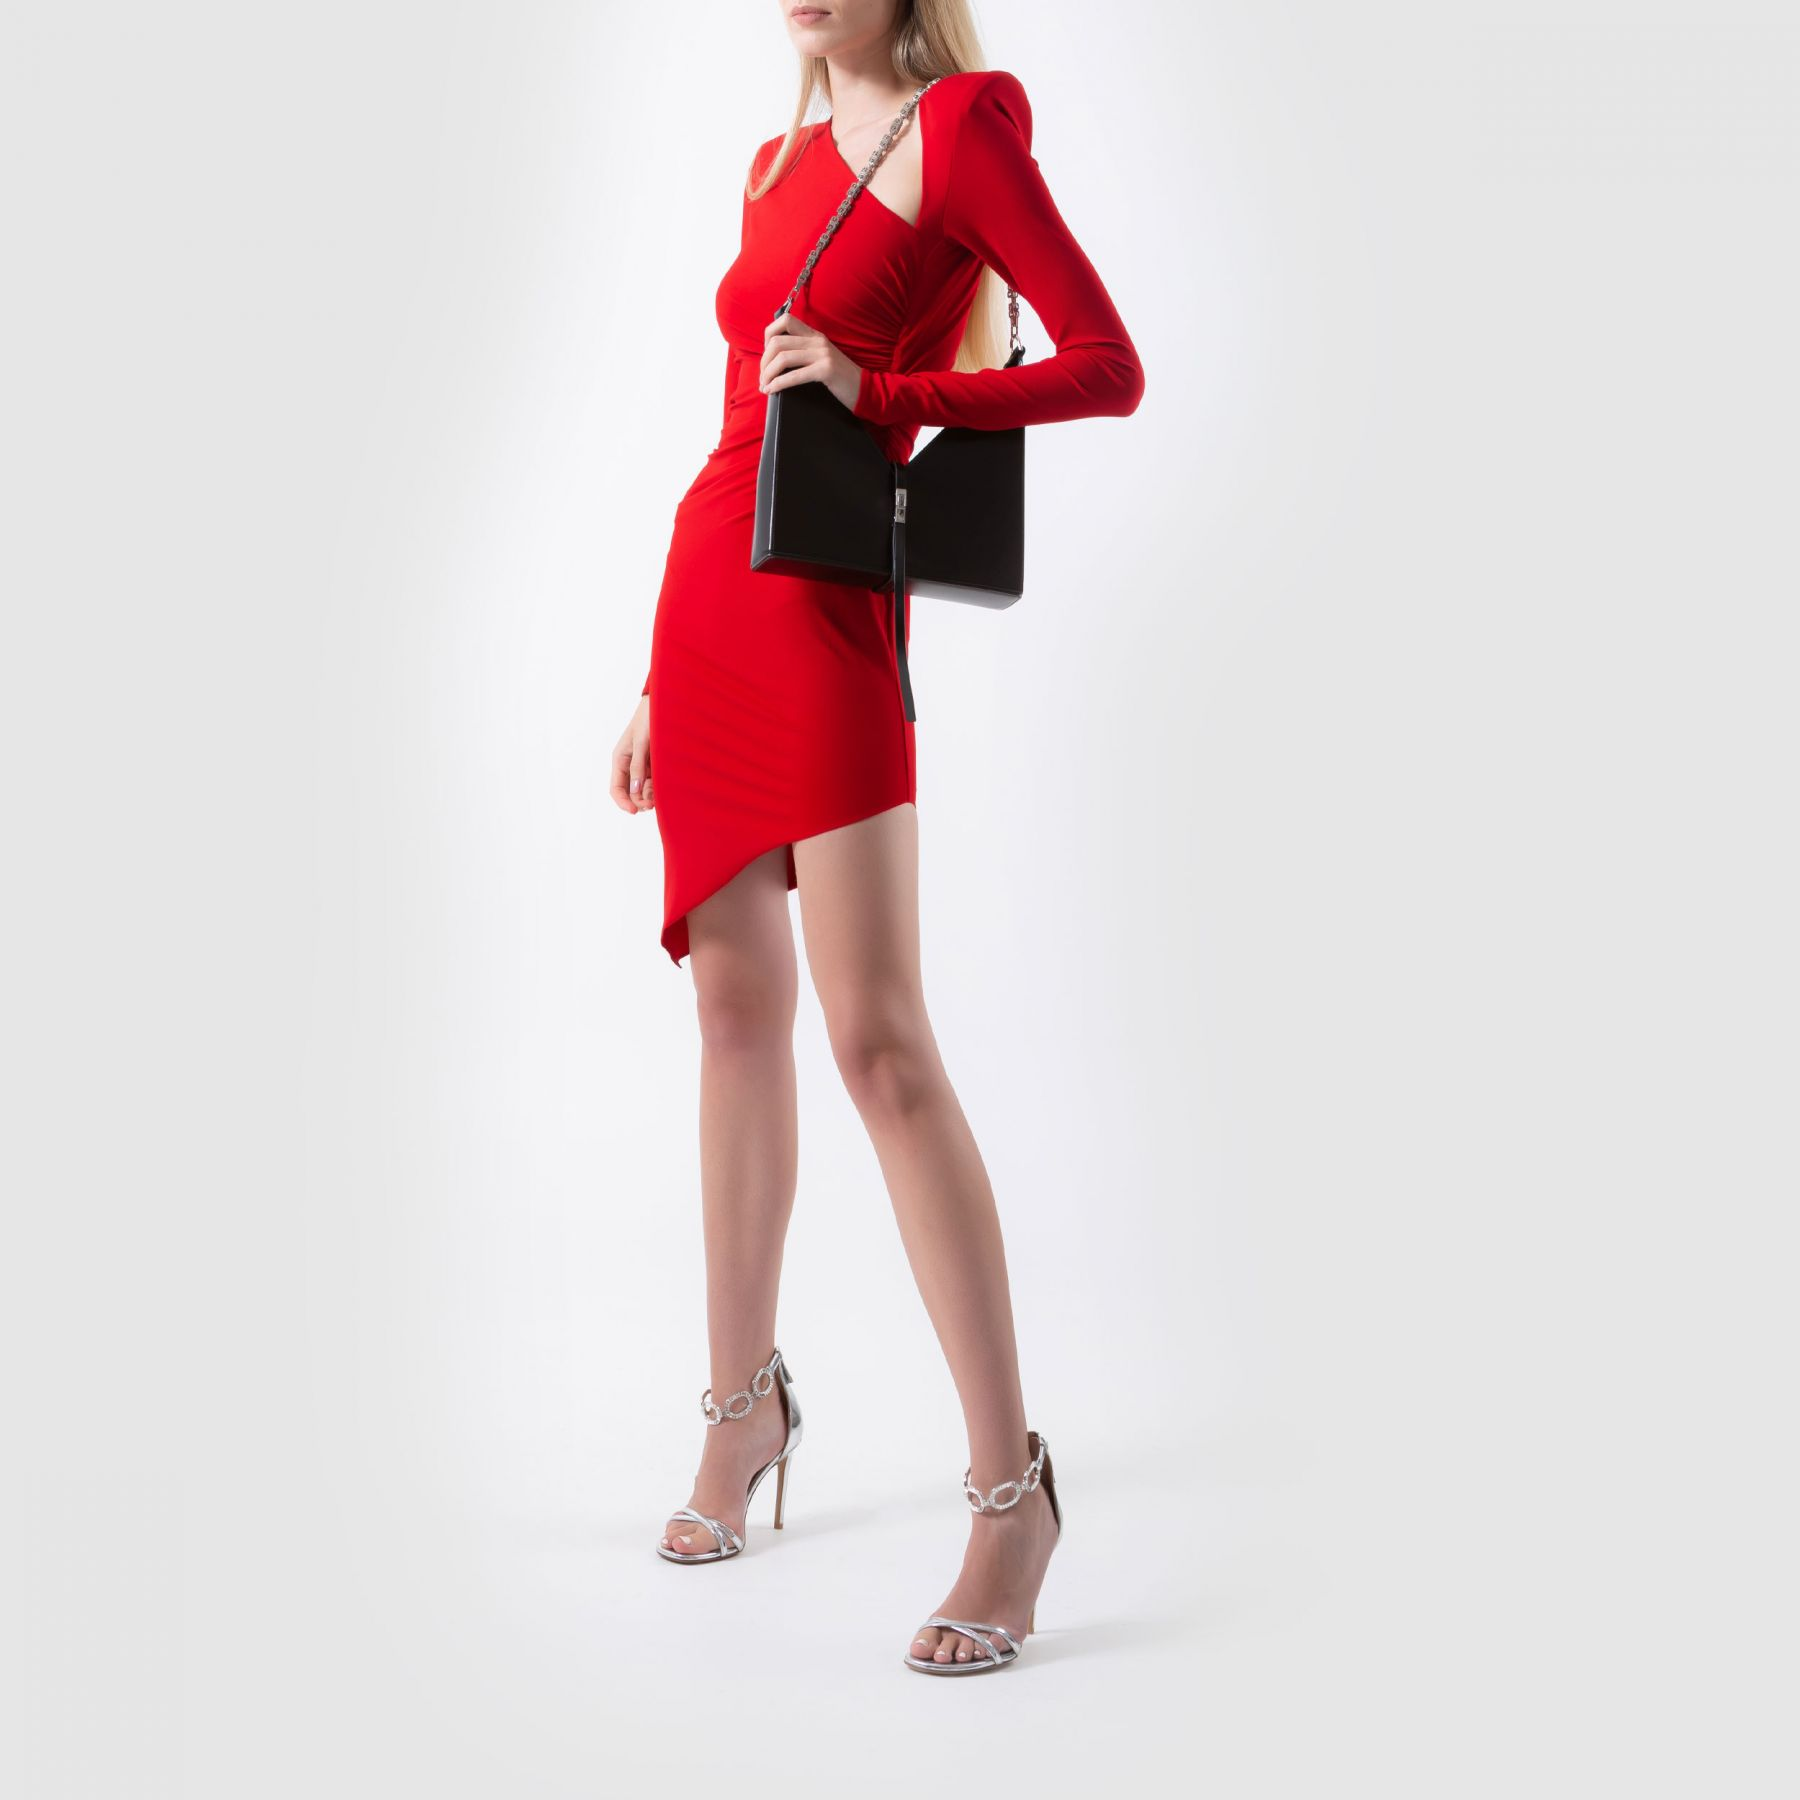 Сумка Givenchy CUT OUT черная